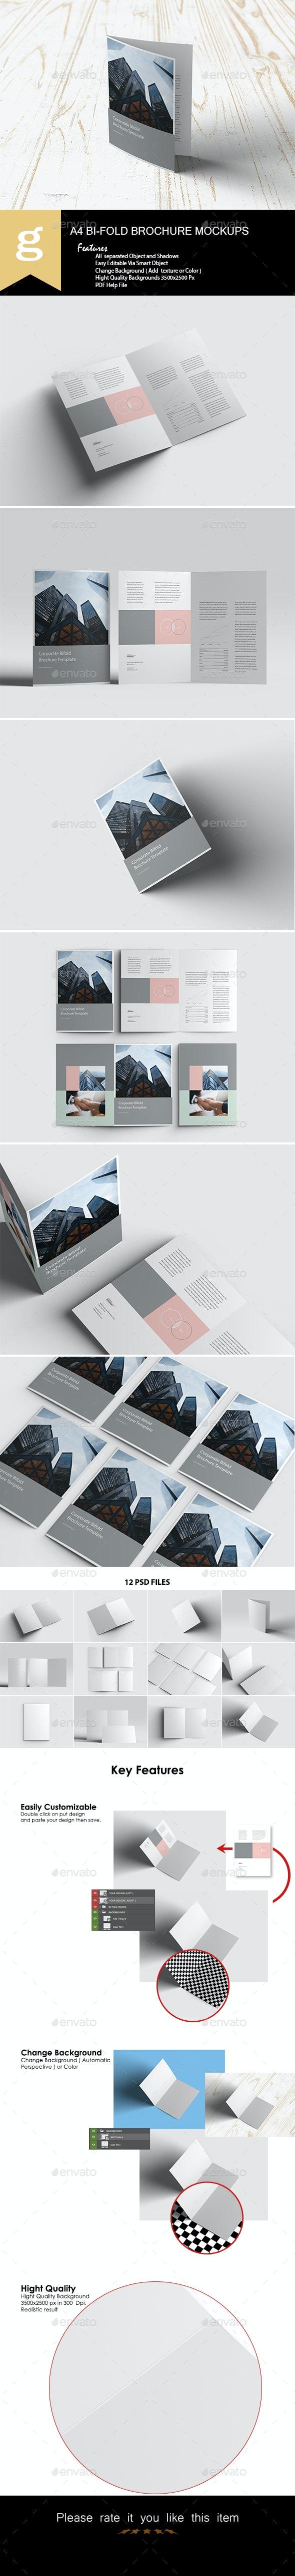 A4 Bifold Brochure Mock-Ups - Brochures Print